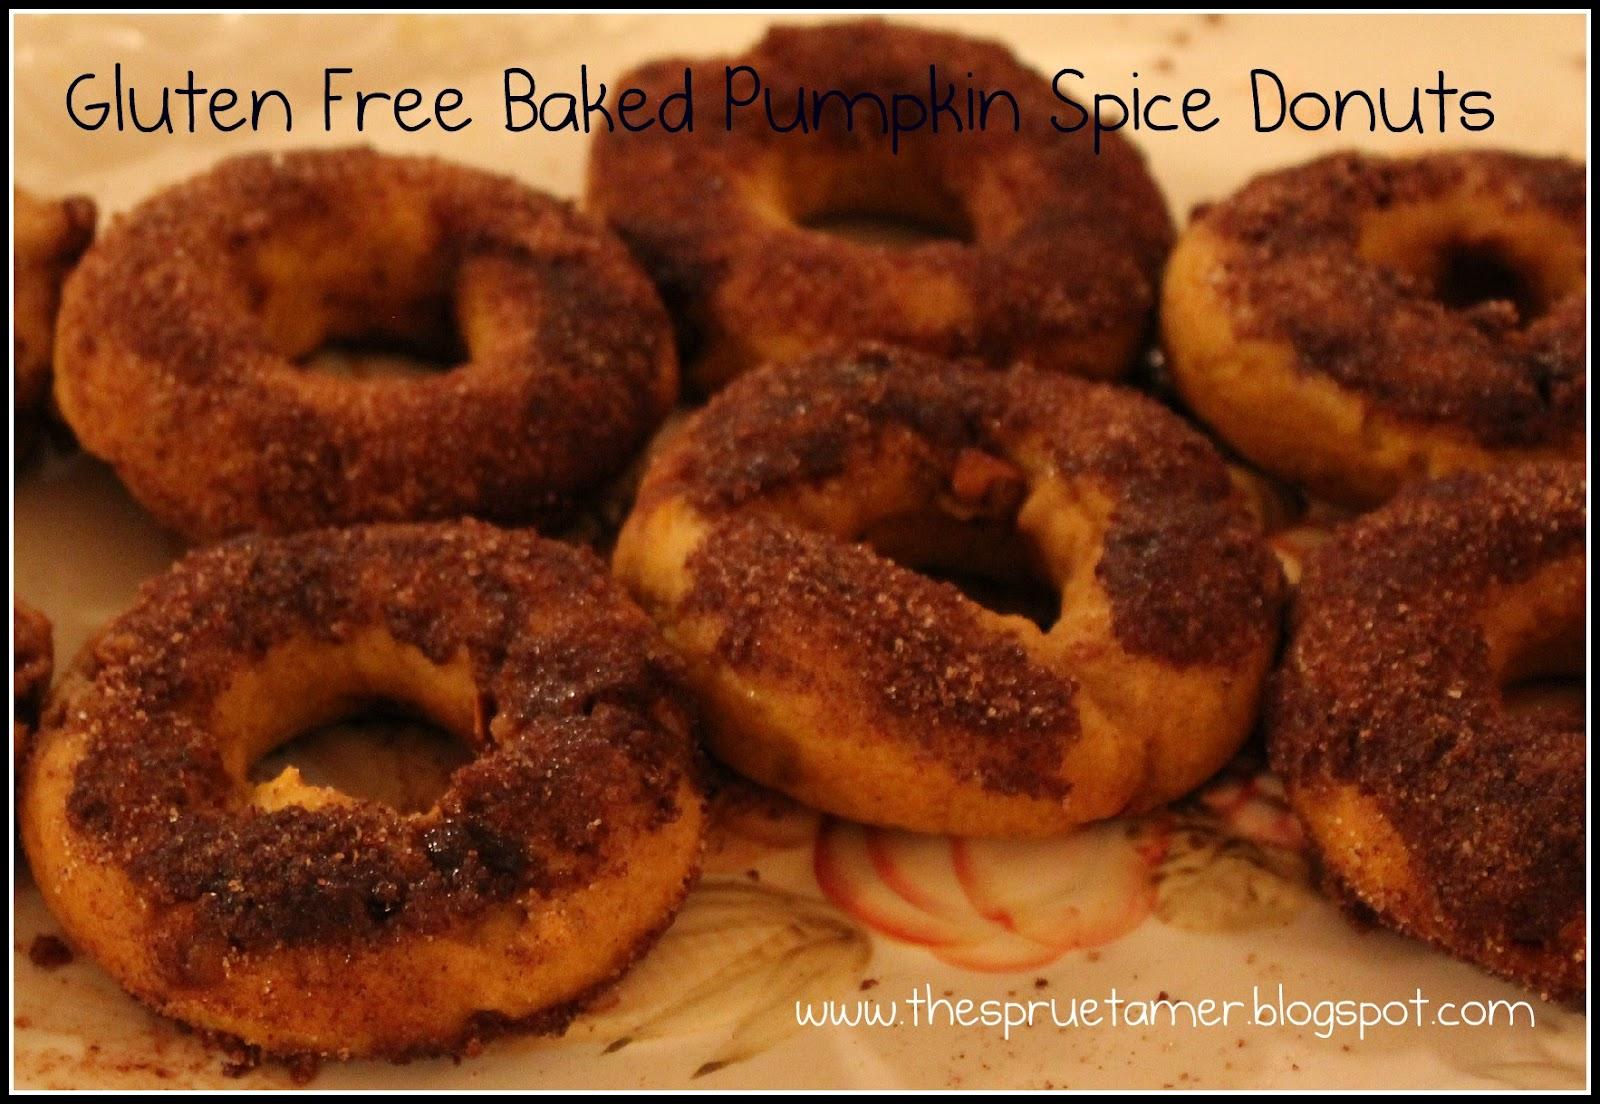 Taming of the {celiac} Sprue: Gluten Free Baked Pumpkin Spice Donuts